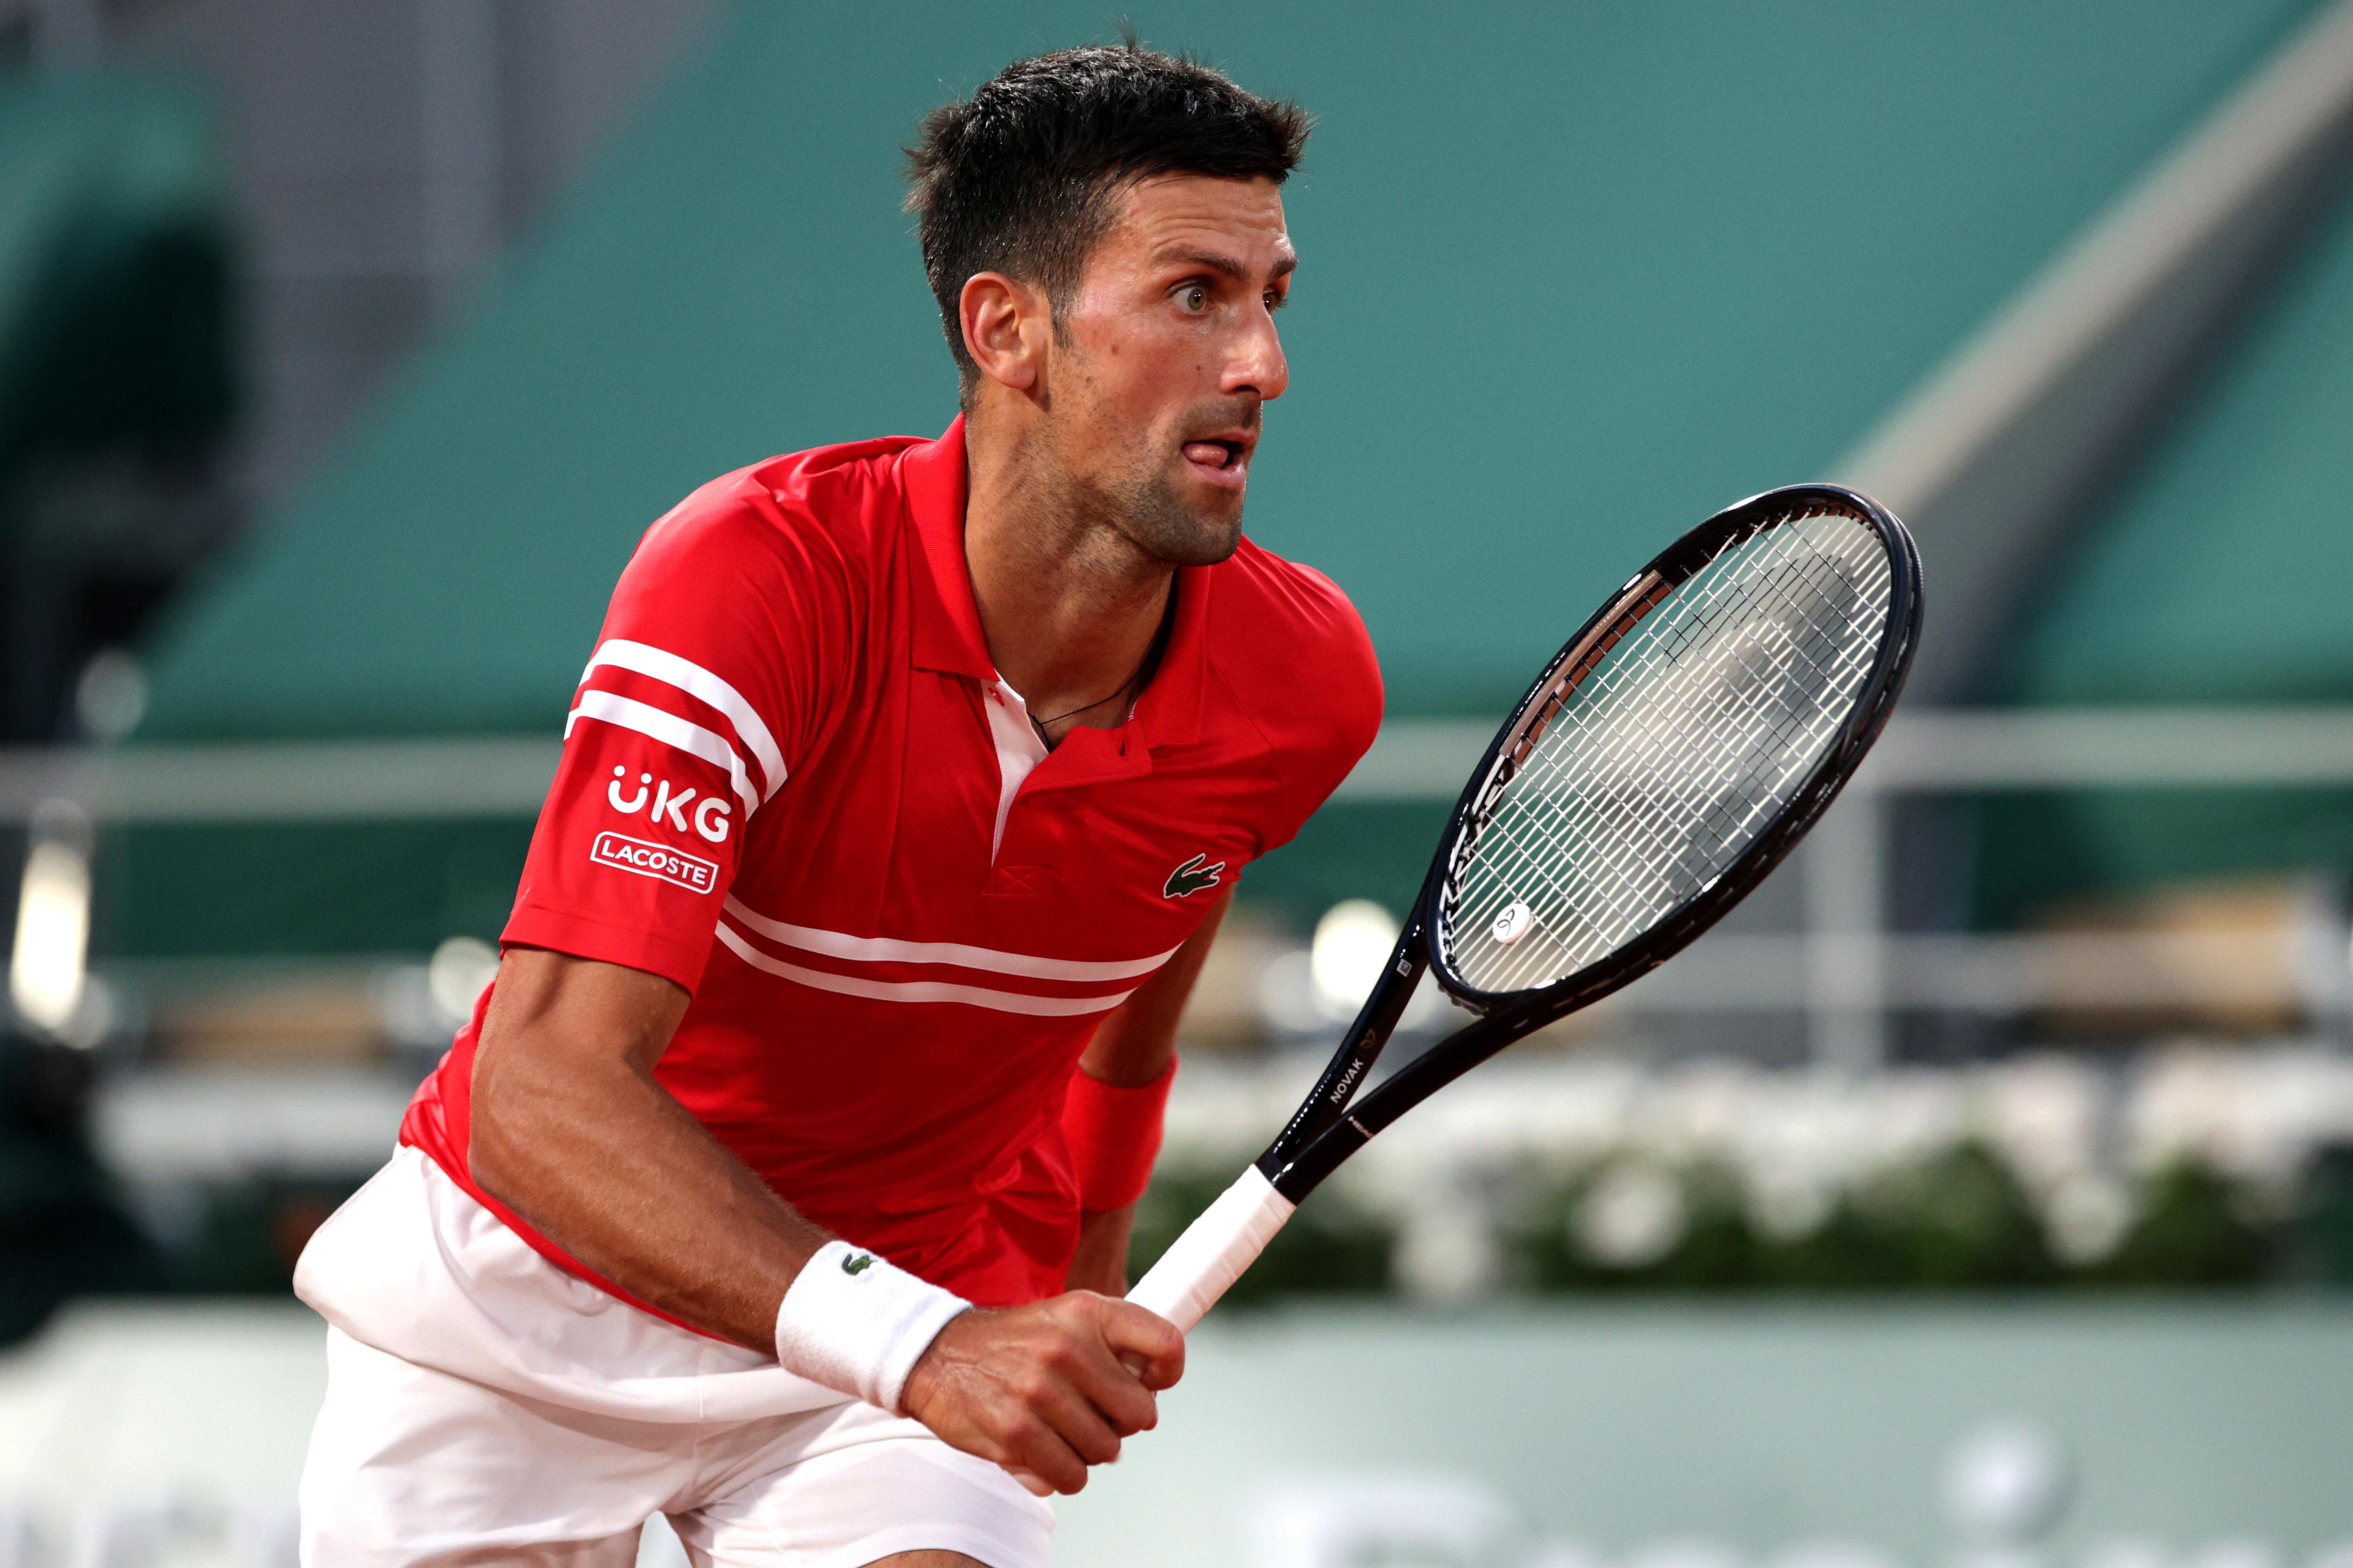 Roland Garros 2021: Novak Djokovic vs. Pablo Cuevas Tennis Pick and Prediction